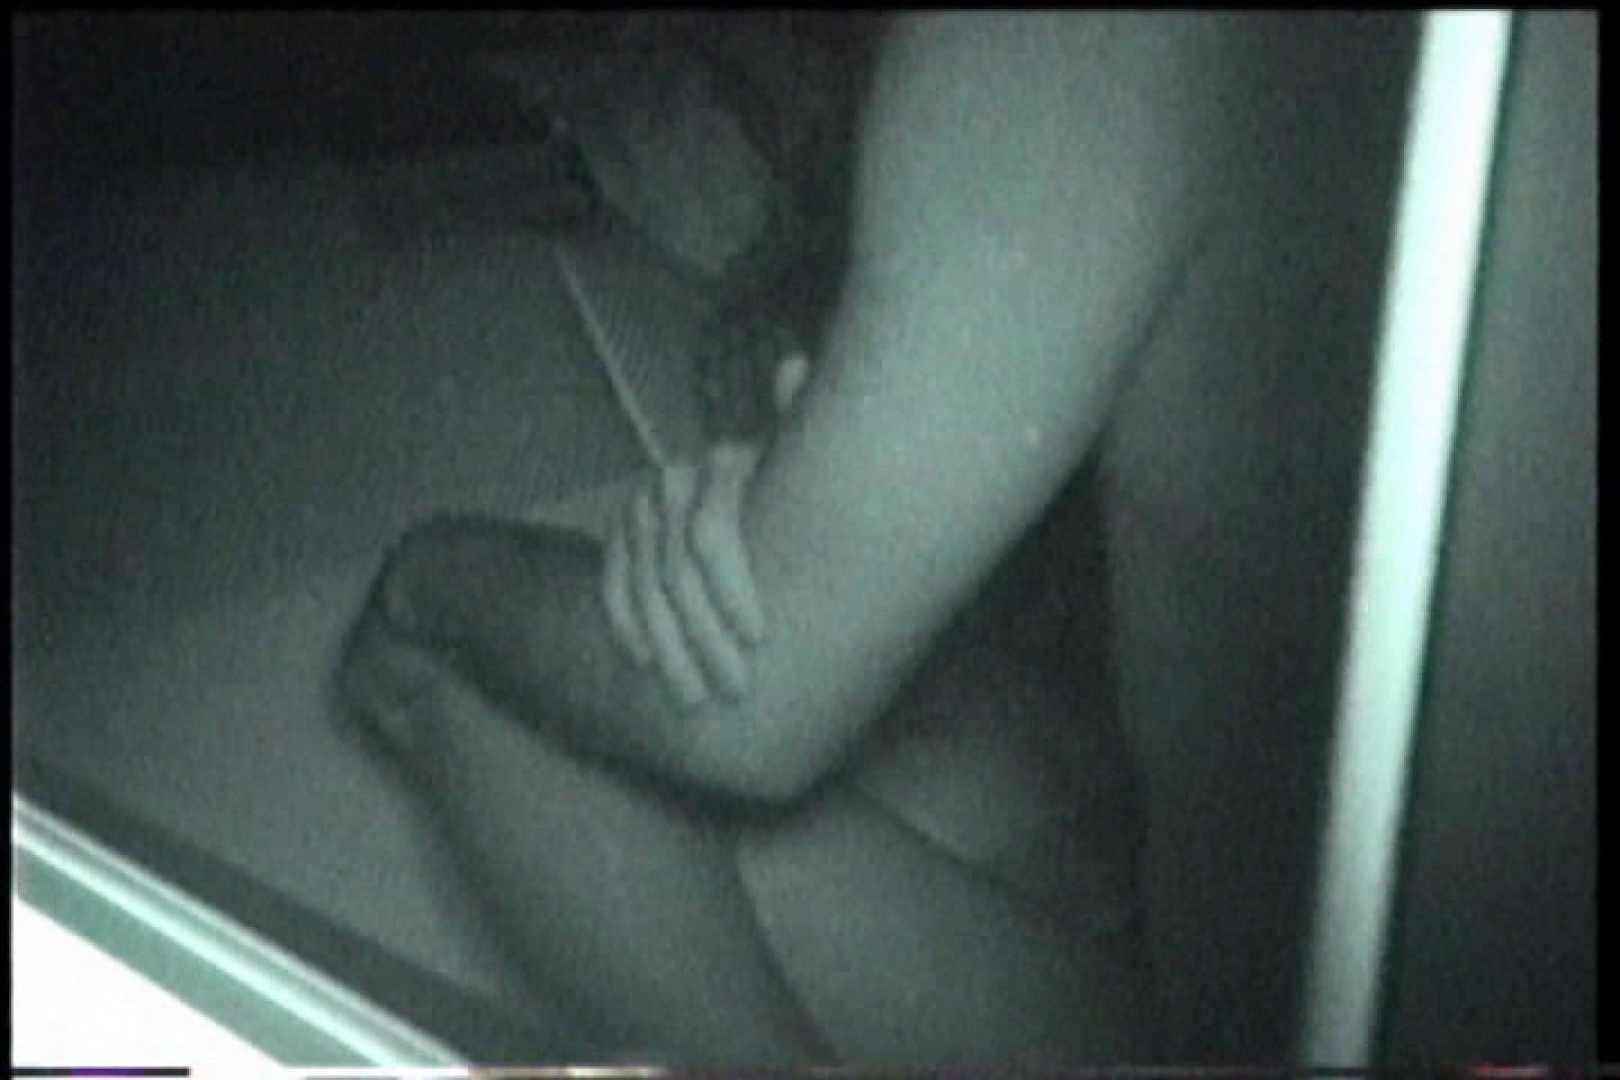 充血監督の深夜の運動会Vol.189 美乳 エロ無料画像 101画像 76